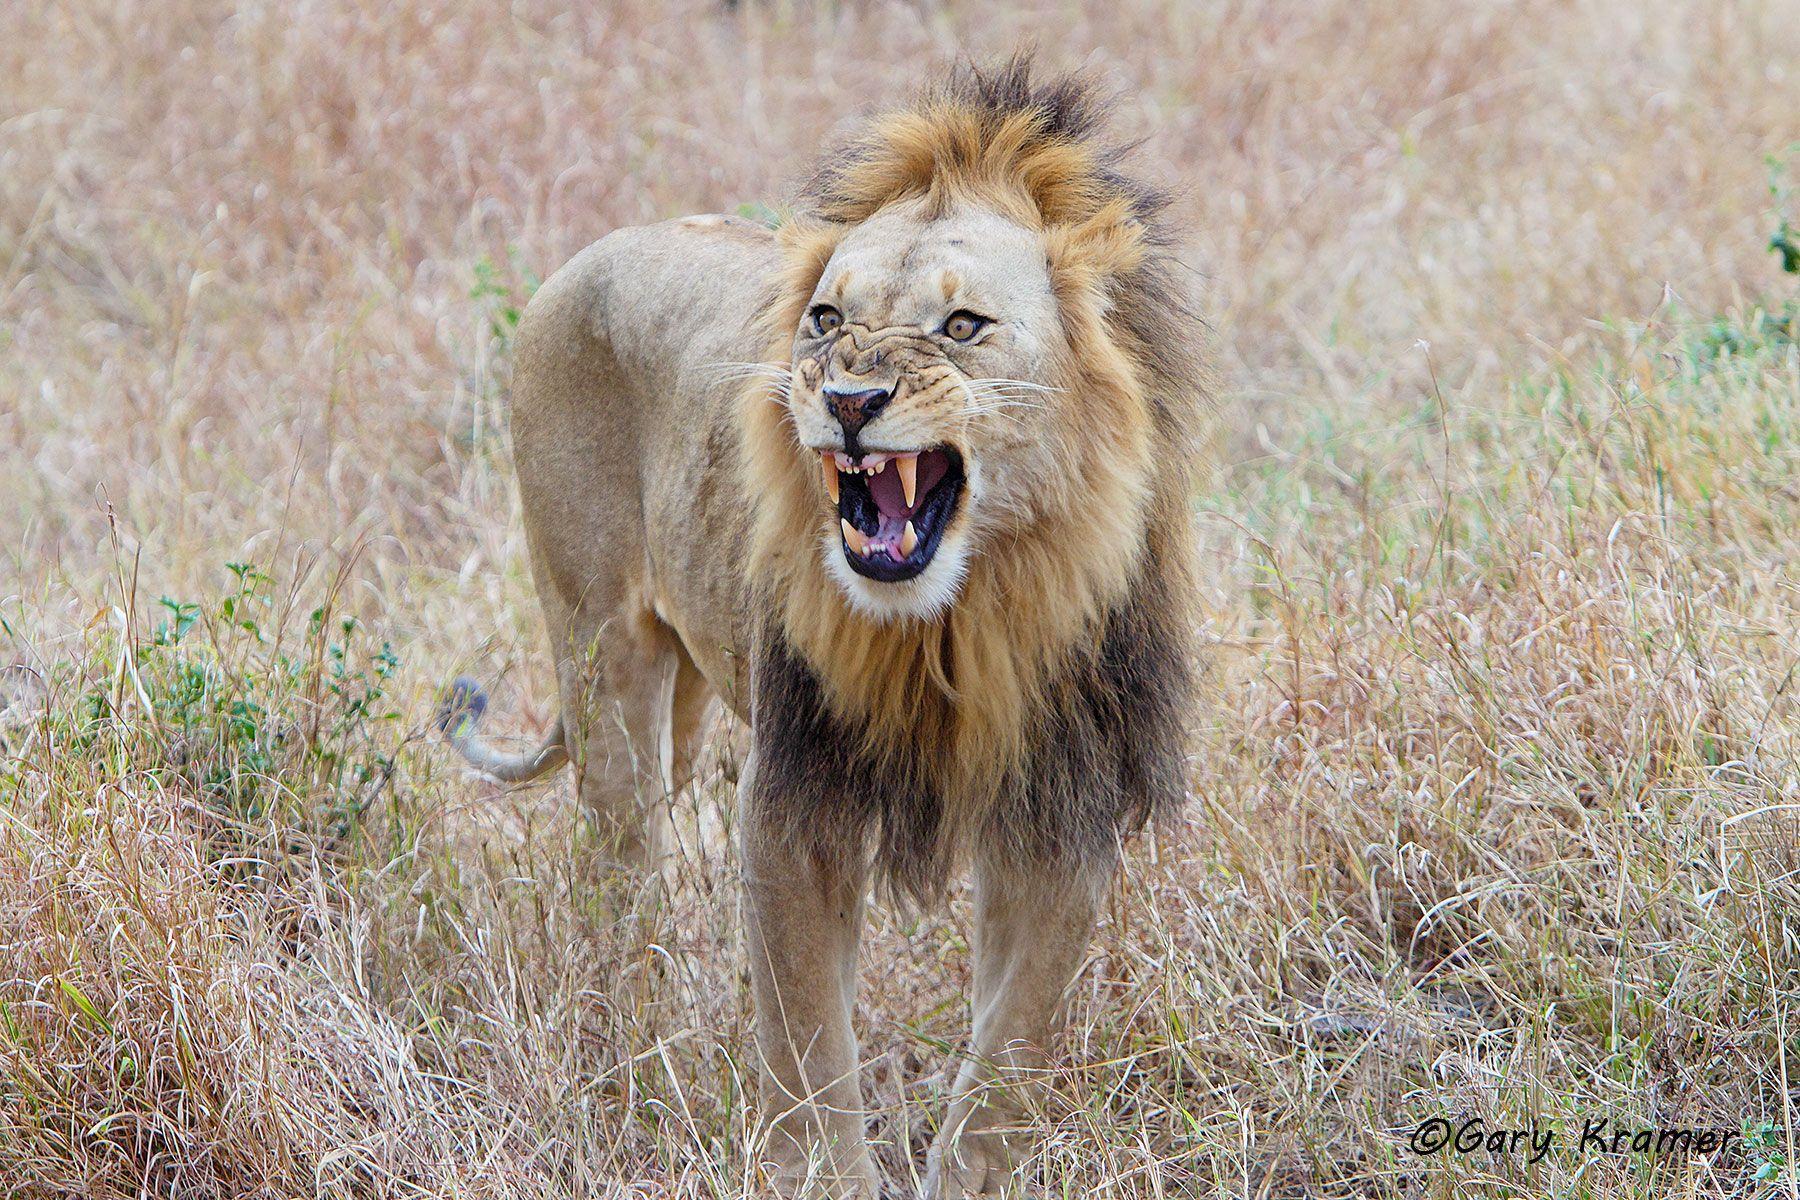 African Lion (Panthera leo) - AMPA#534d